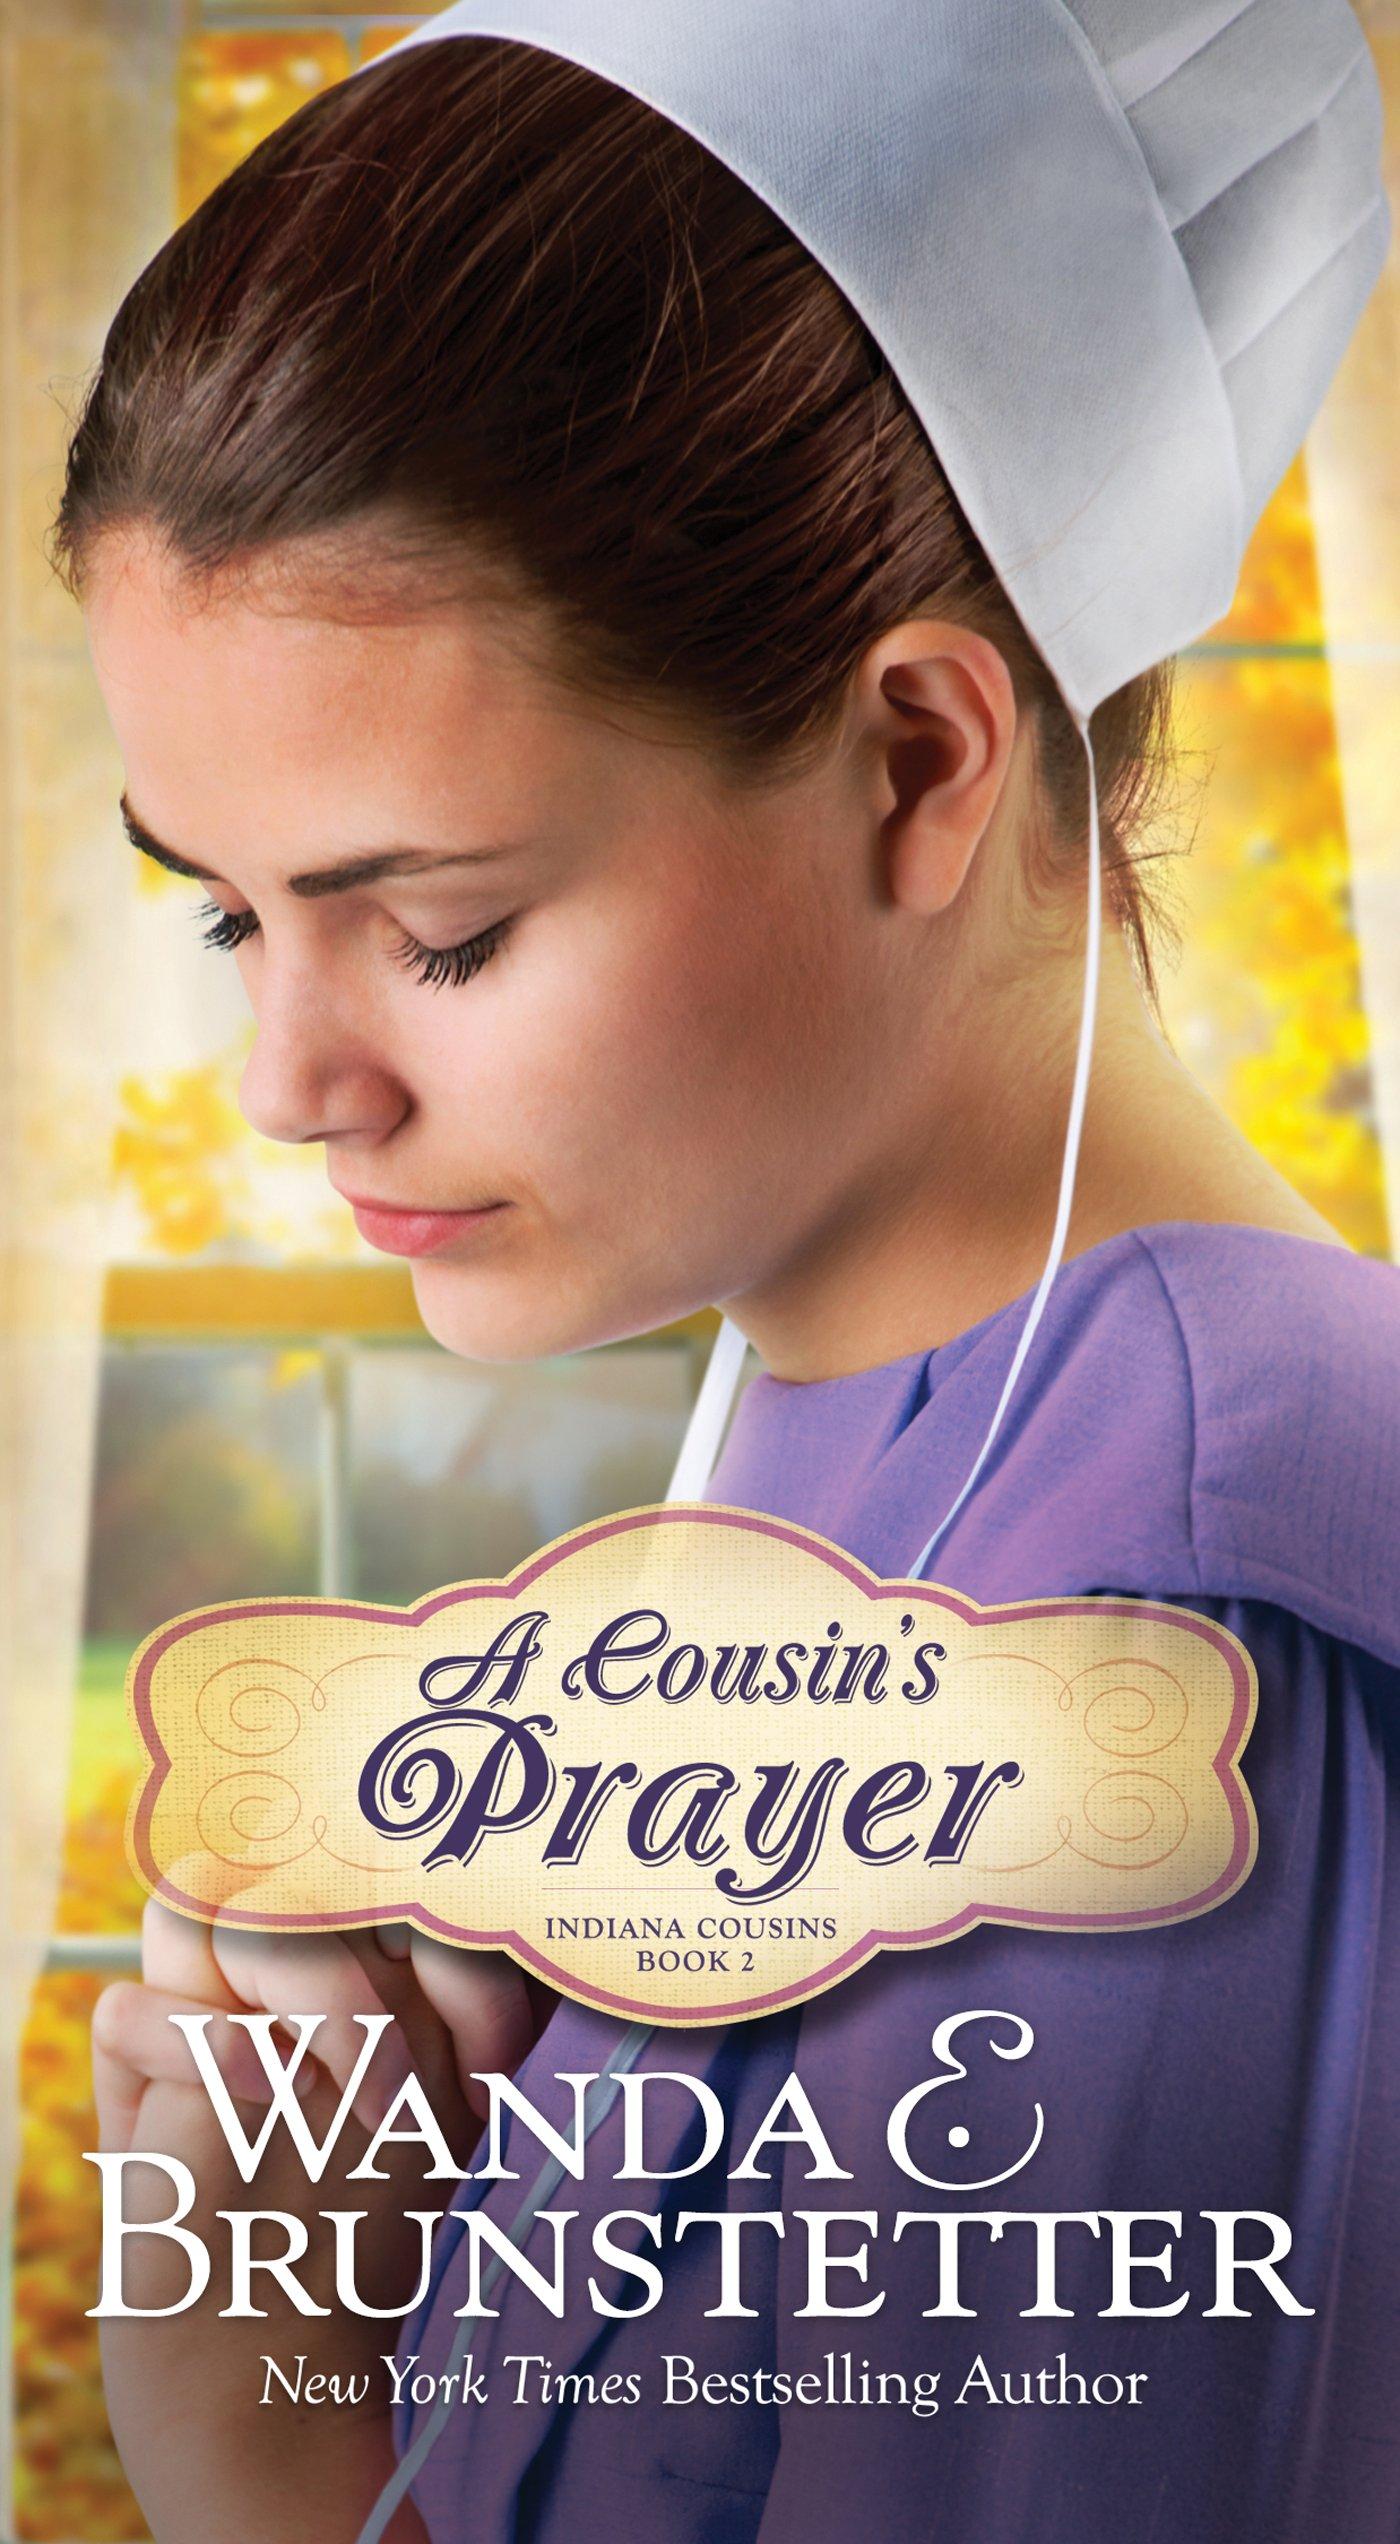 A Cousin's Prayer (Indiana Cousins): Wanda E. Brunstetter: 9781683220695:  Amazon.com: Books